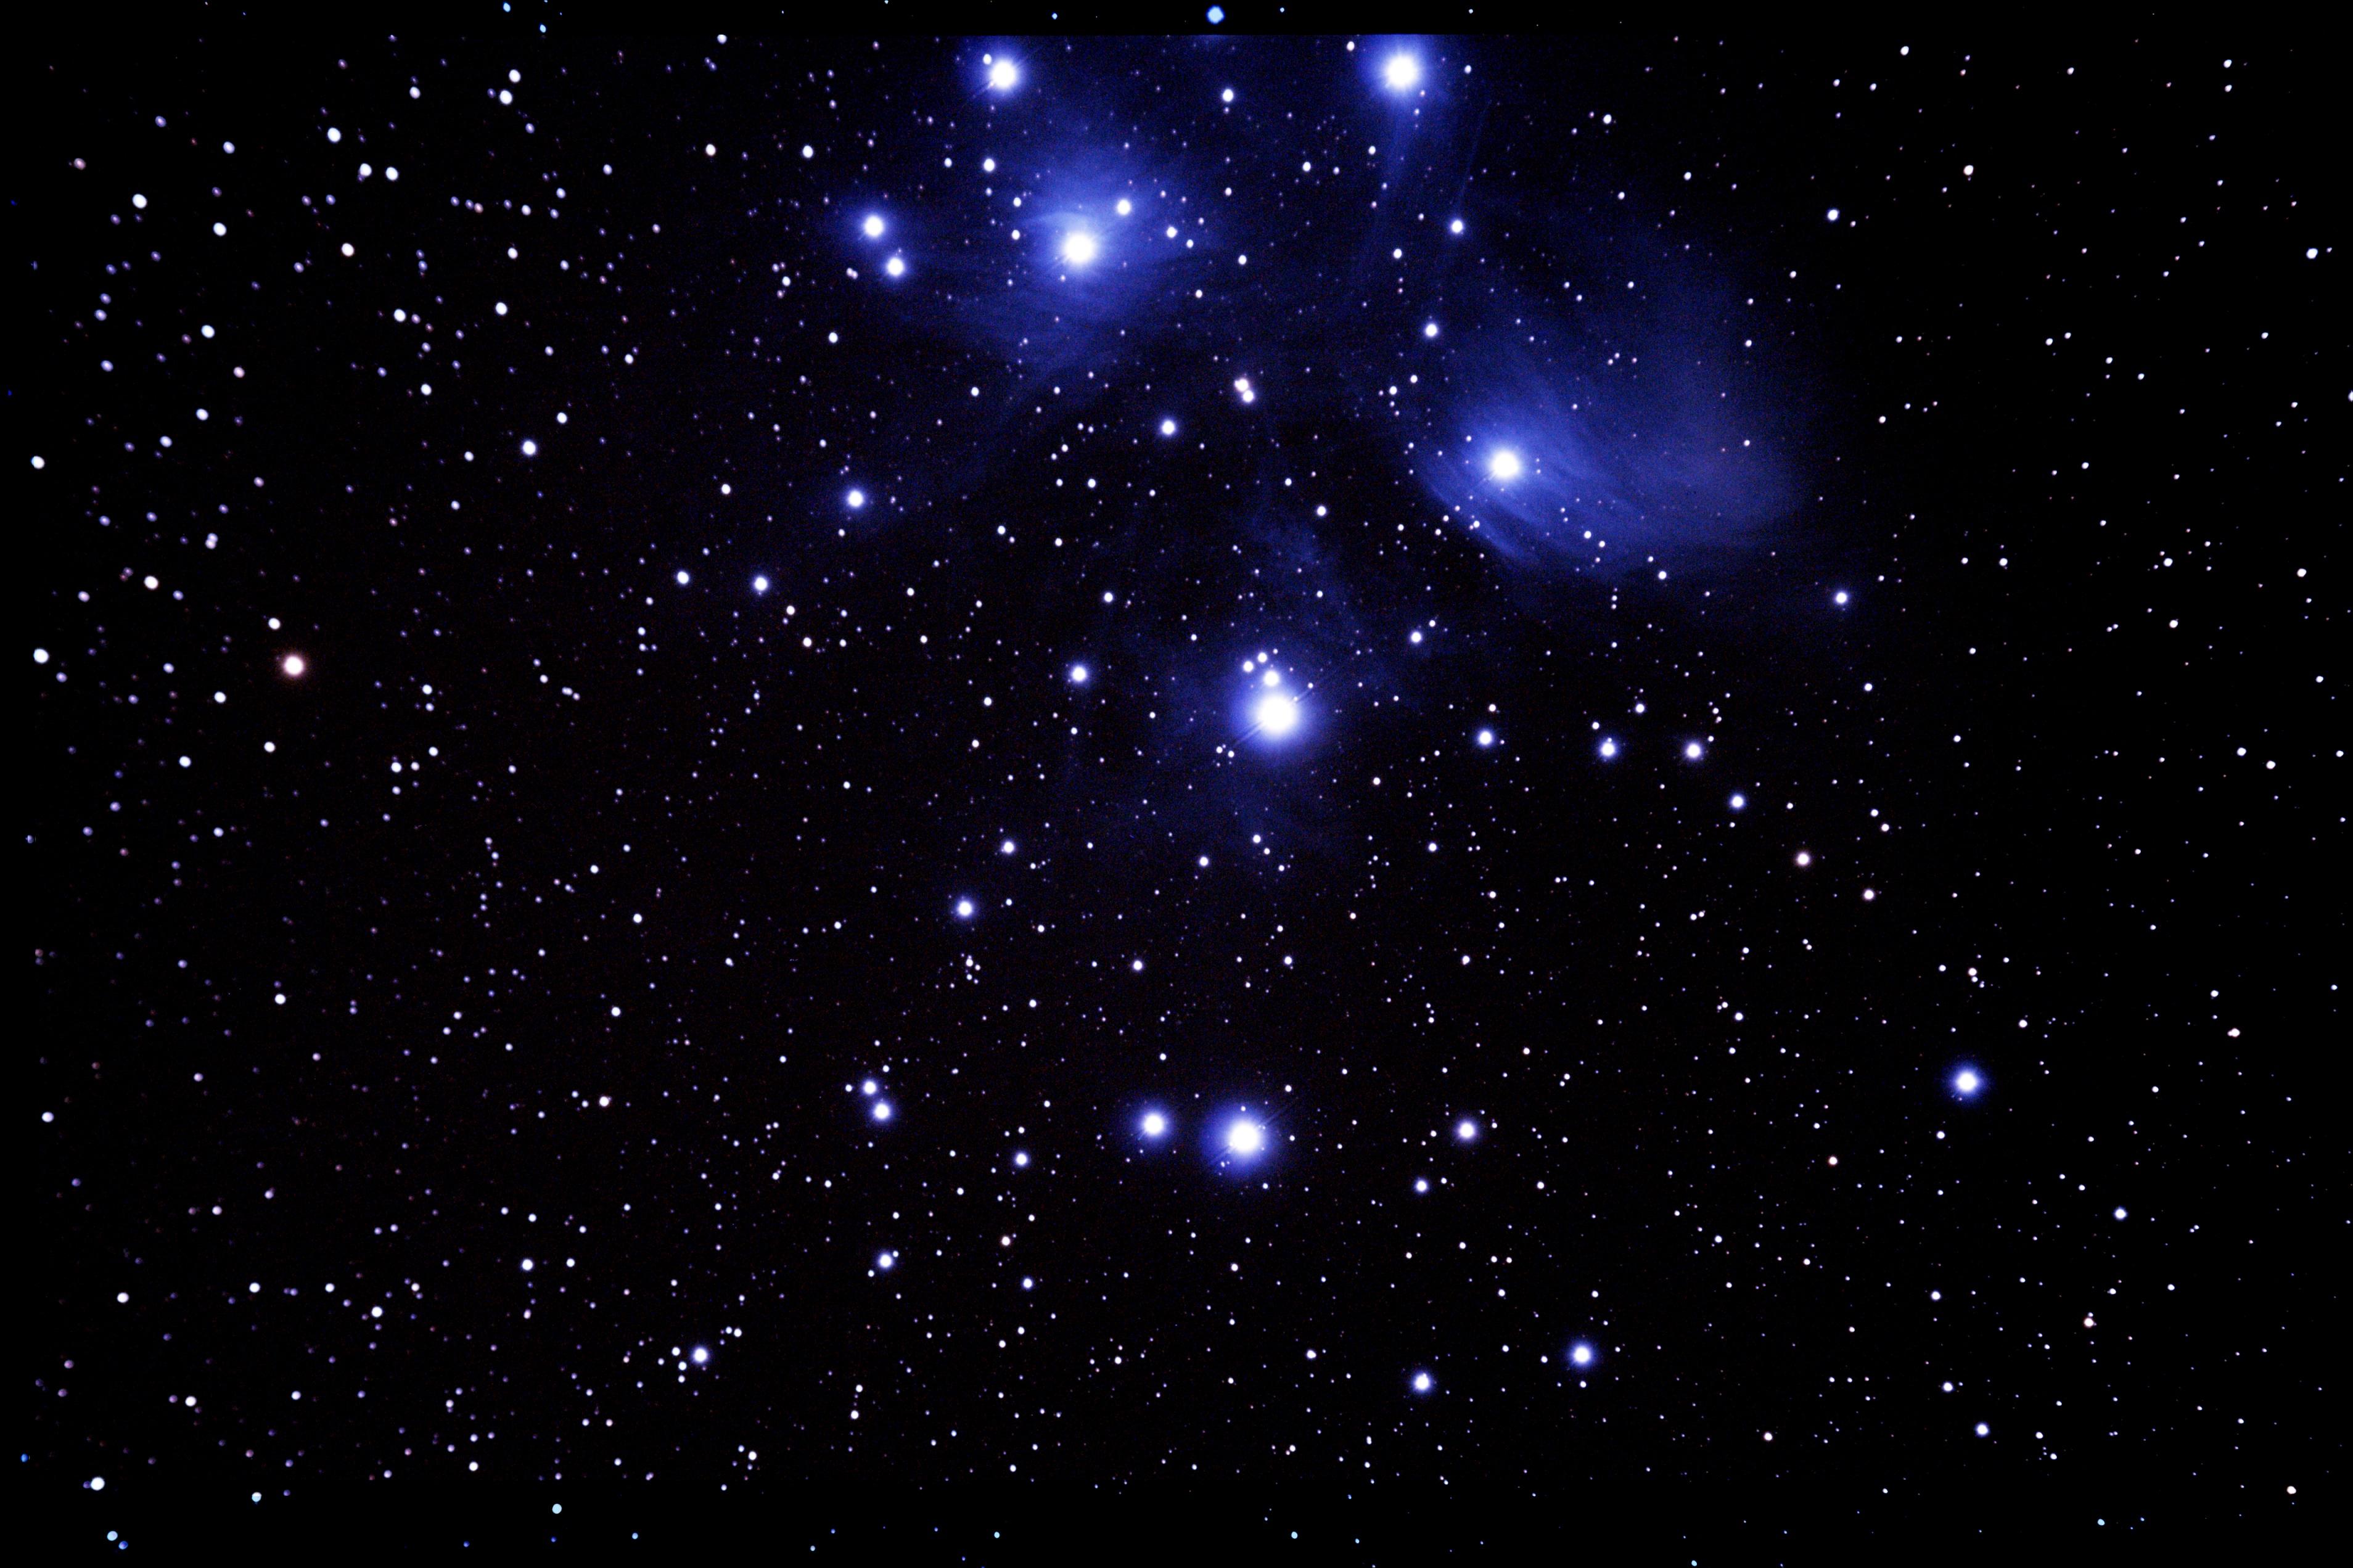 M45 昴星团.jpg